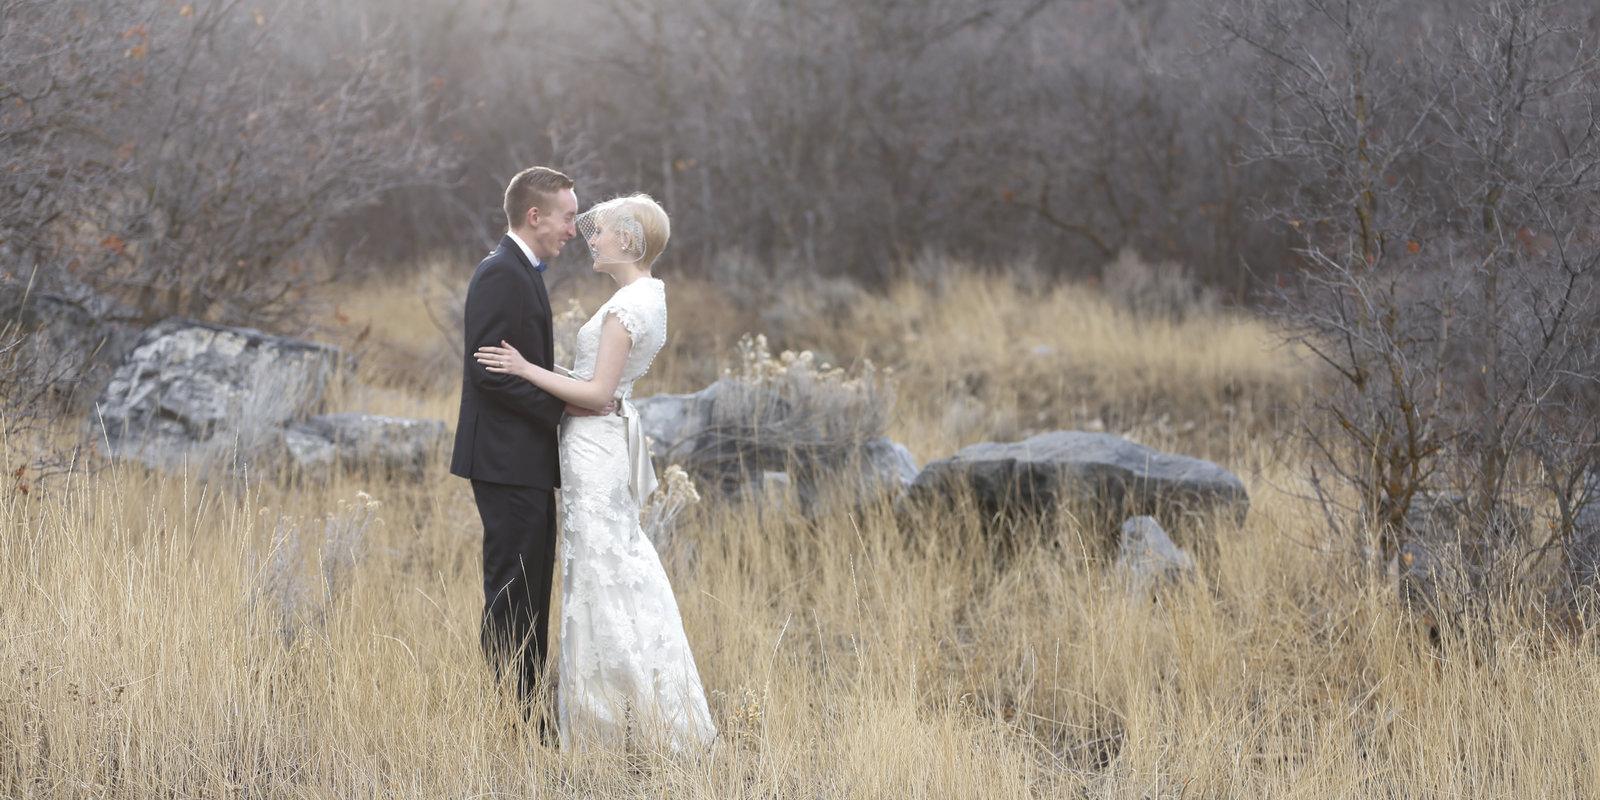 destination wedding photographer chicago illinois wedding photographer-7253-2